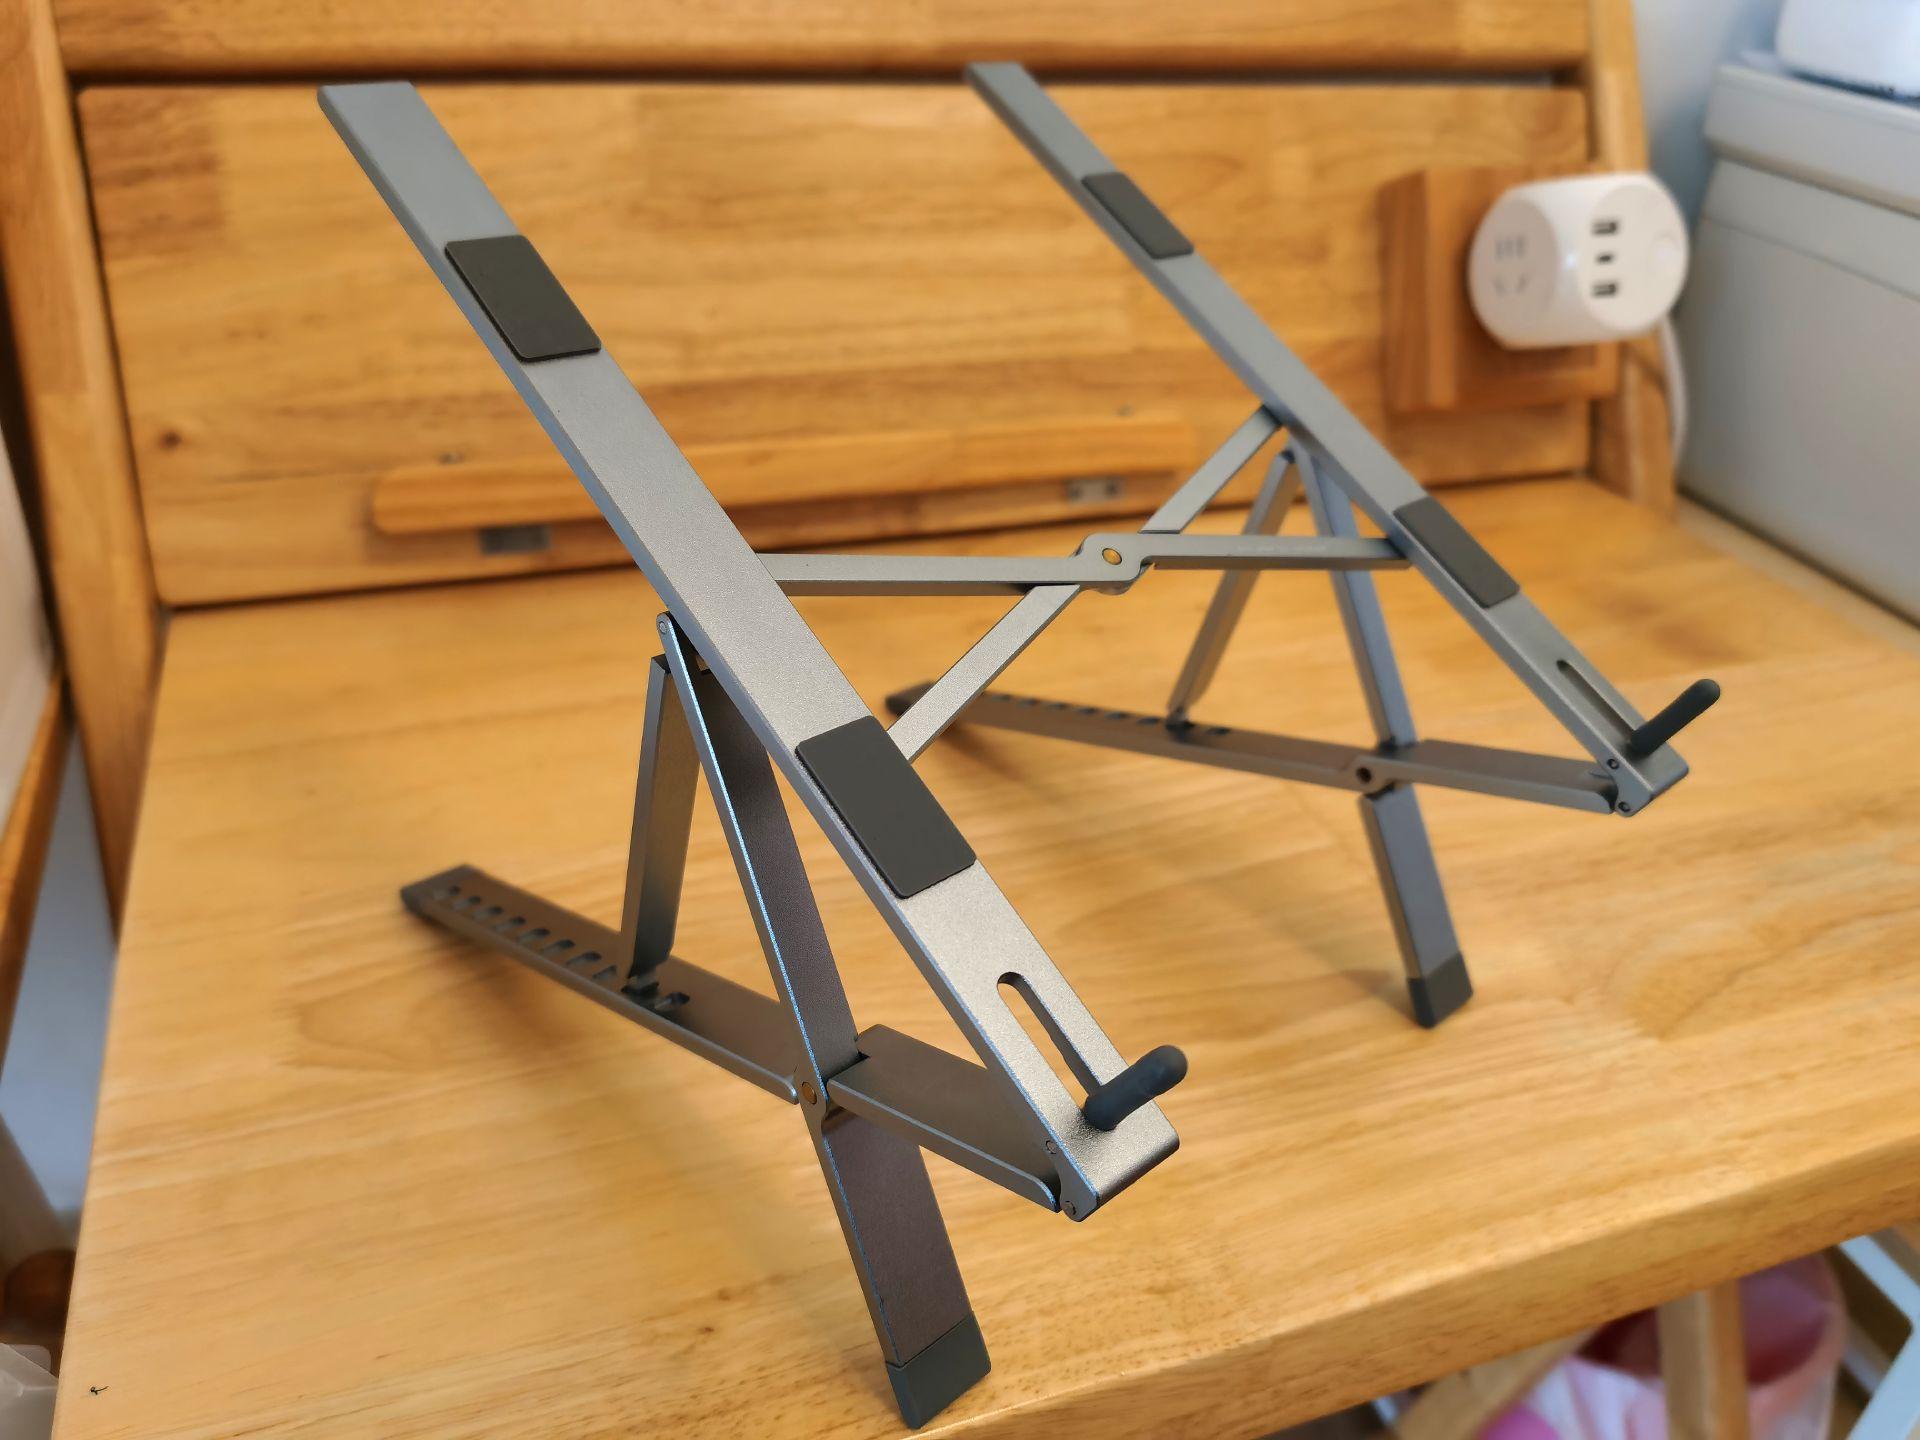 Oatsbasf Laptop Stand and Riser